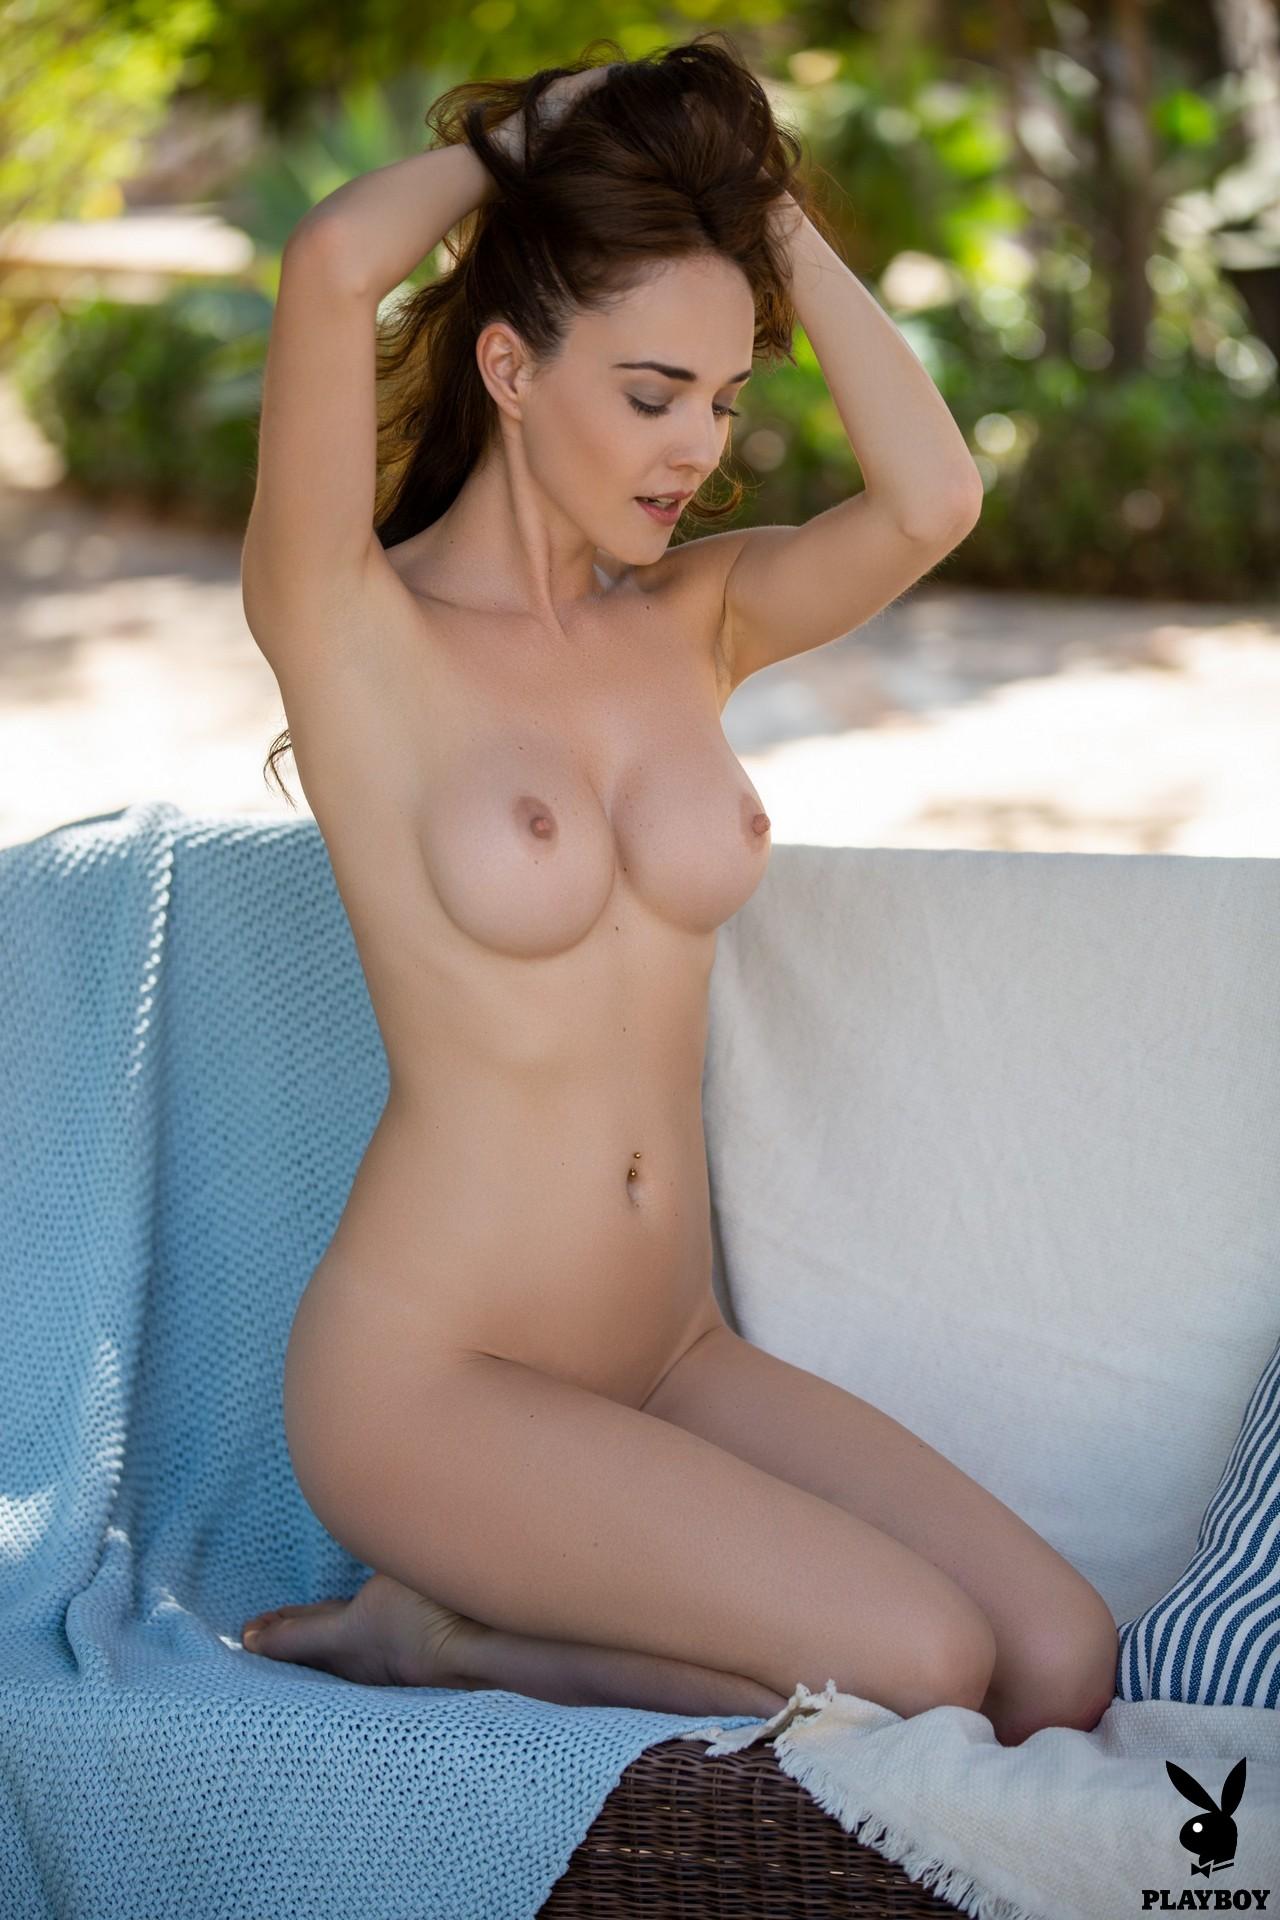 Bianka Helen - Serene Seduction at HQ Sluts